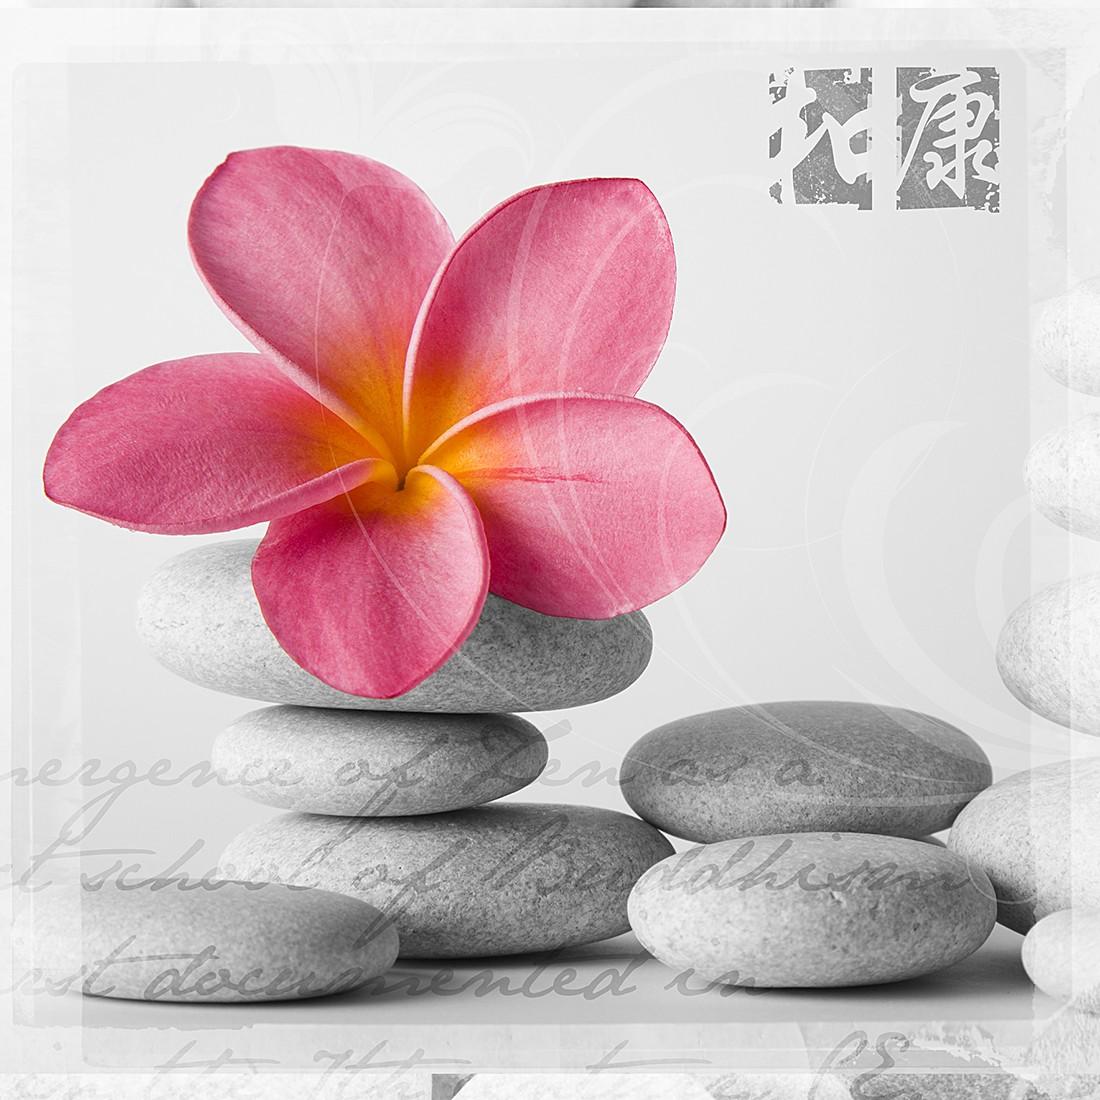 Print achter glas Frangipani Pink II 50x50, Pro Art